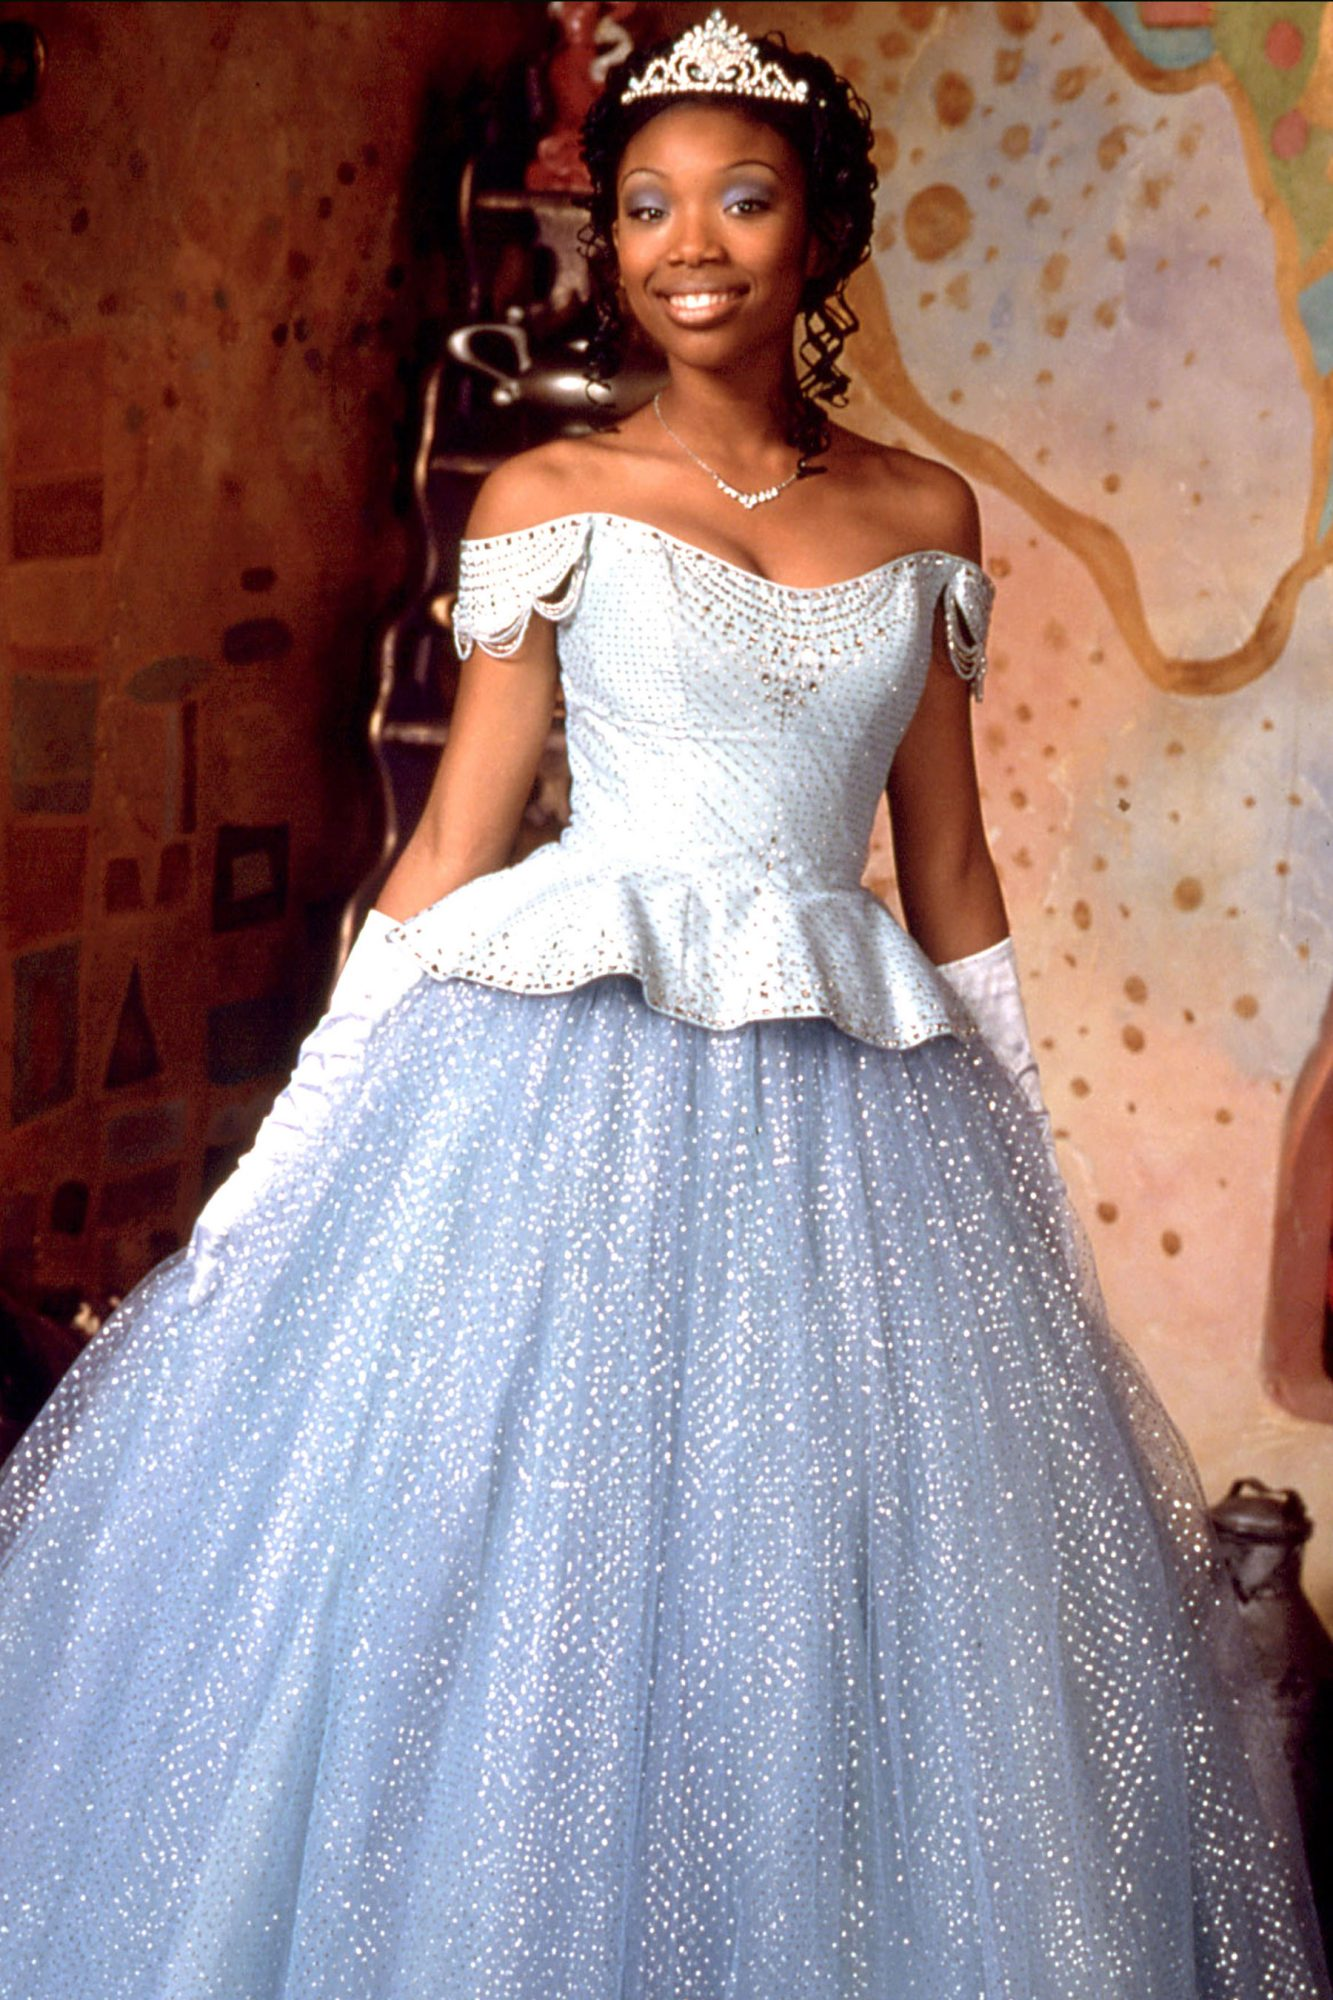 CINDERELLA, Brandy Norwood, 1997. © Walt Disney Television  / Courtesy: Everett Collection